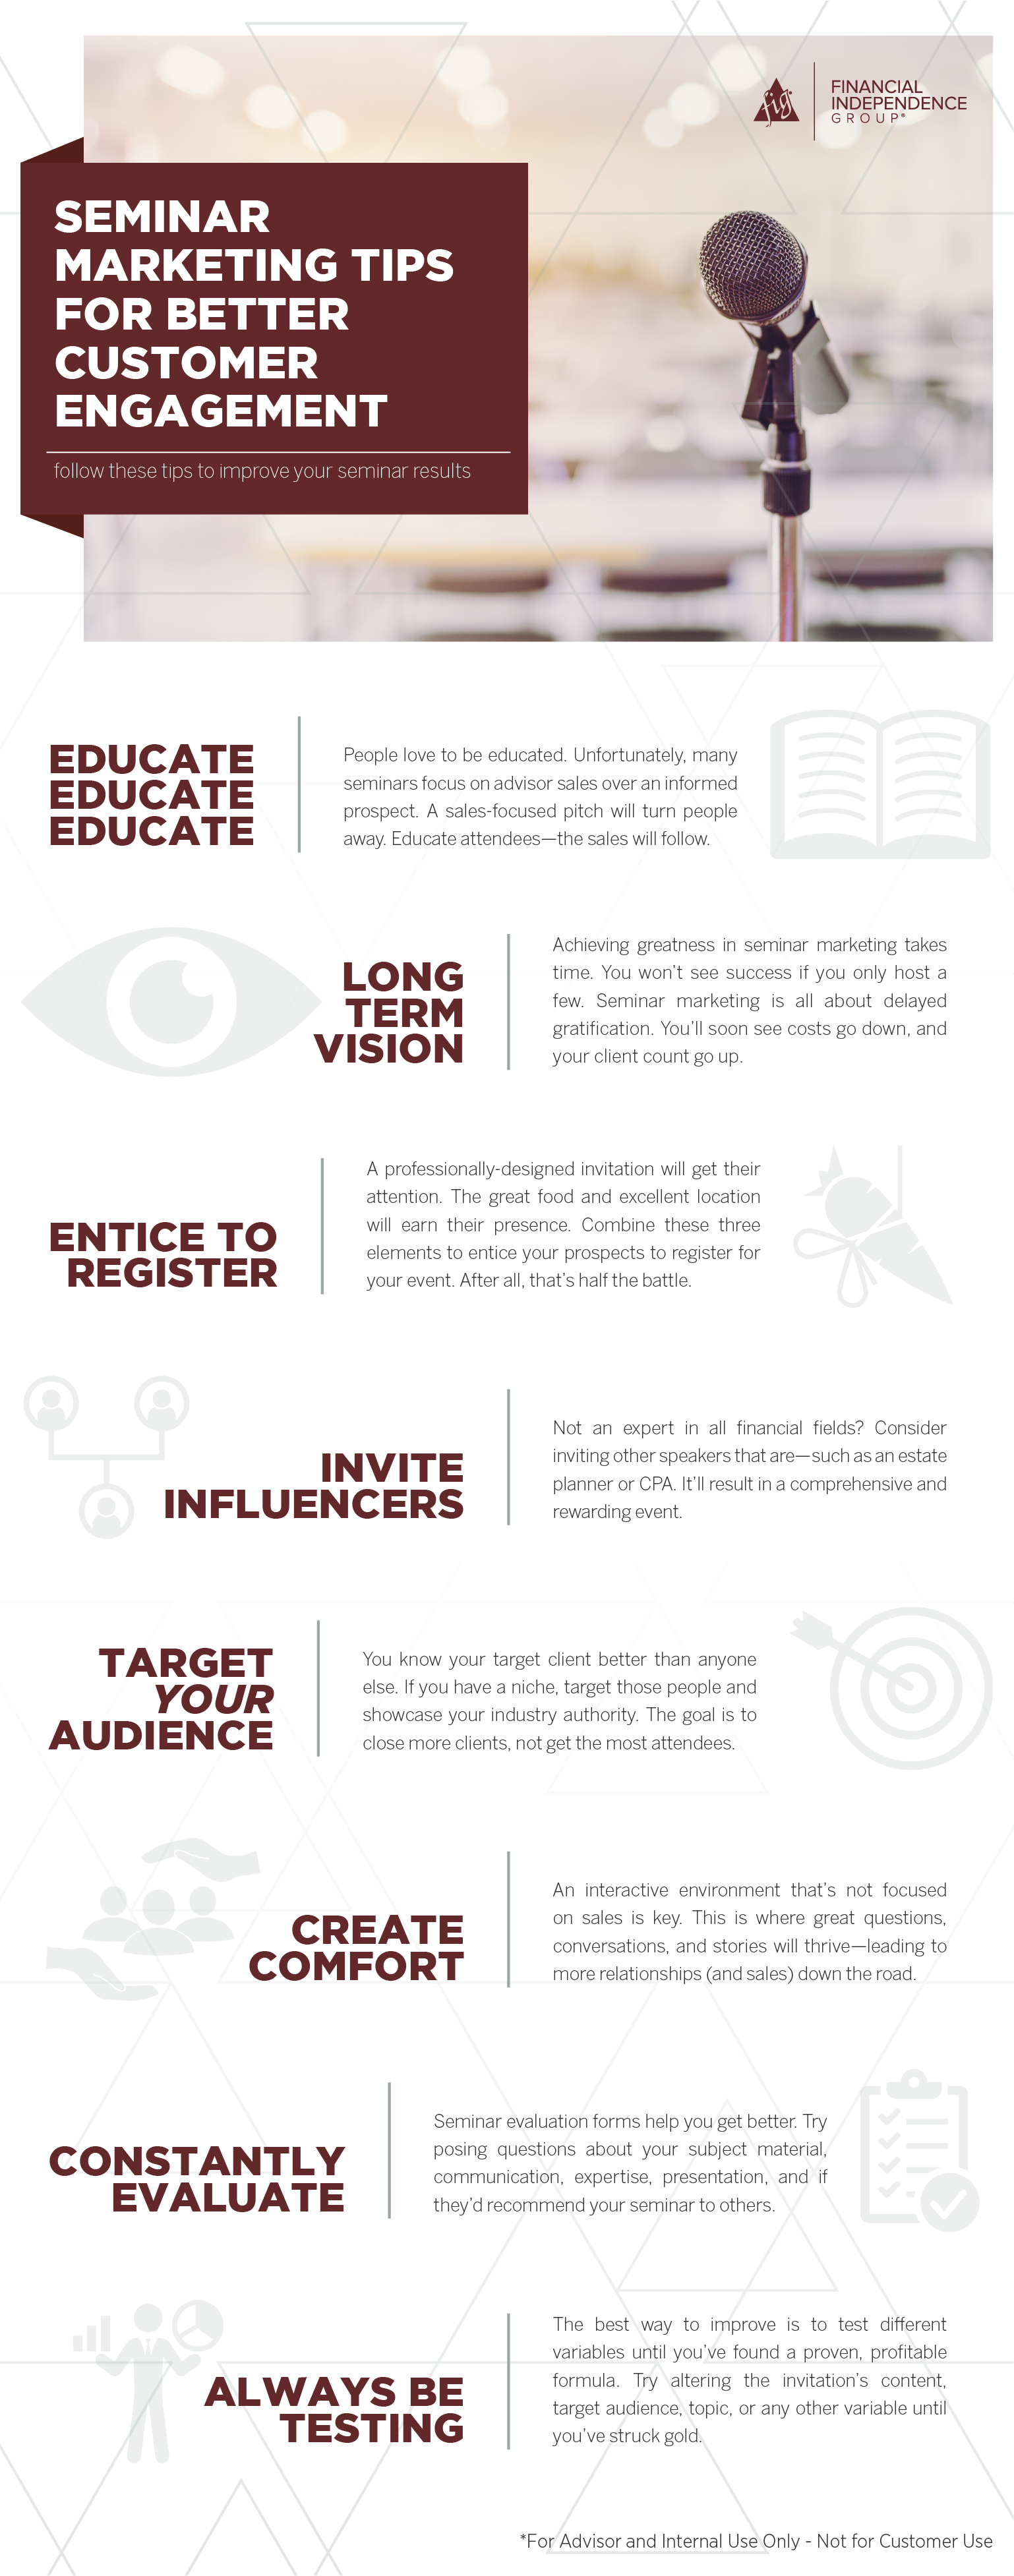 seminar marketing tips for best customner engagement